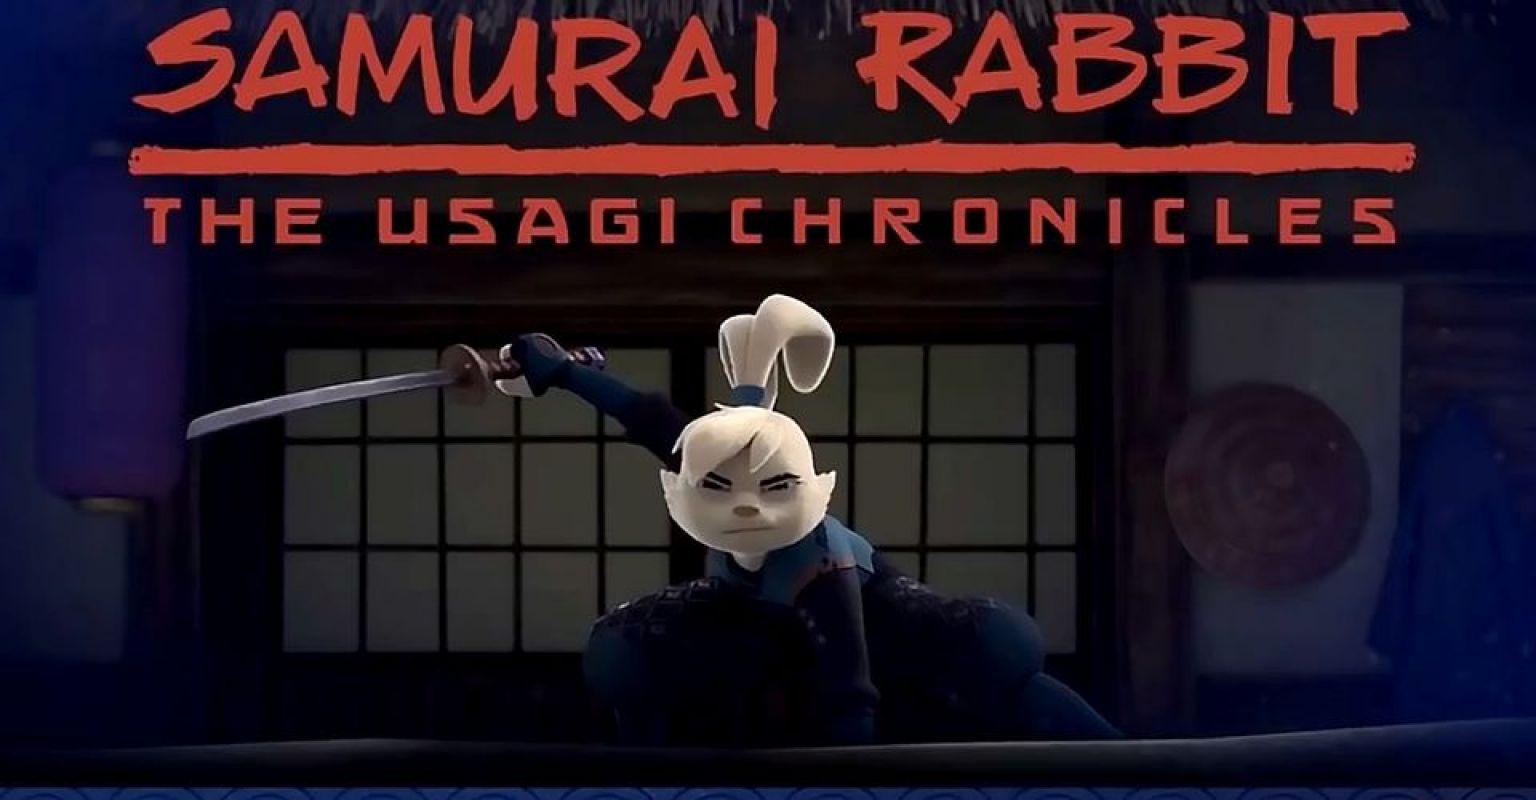 Samurai Rabbit - The Usagi Chronicles !